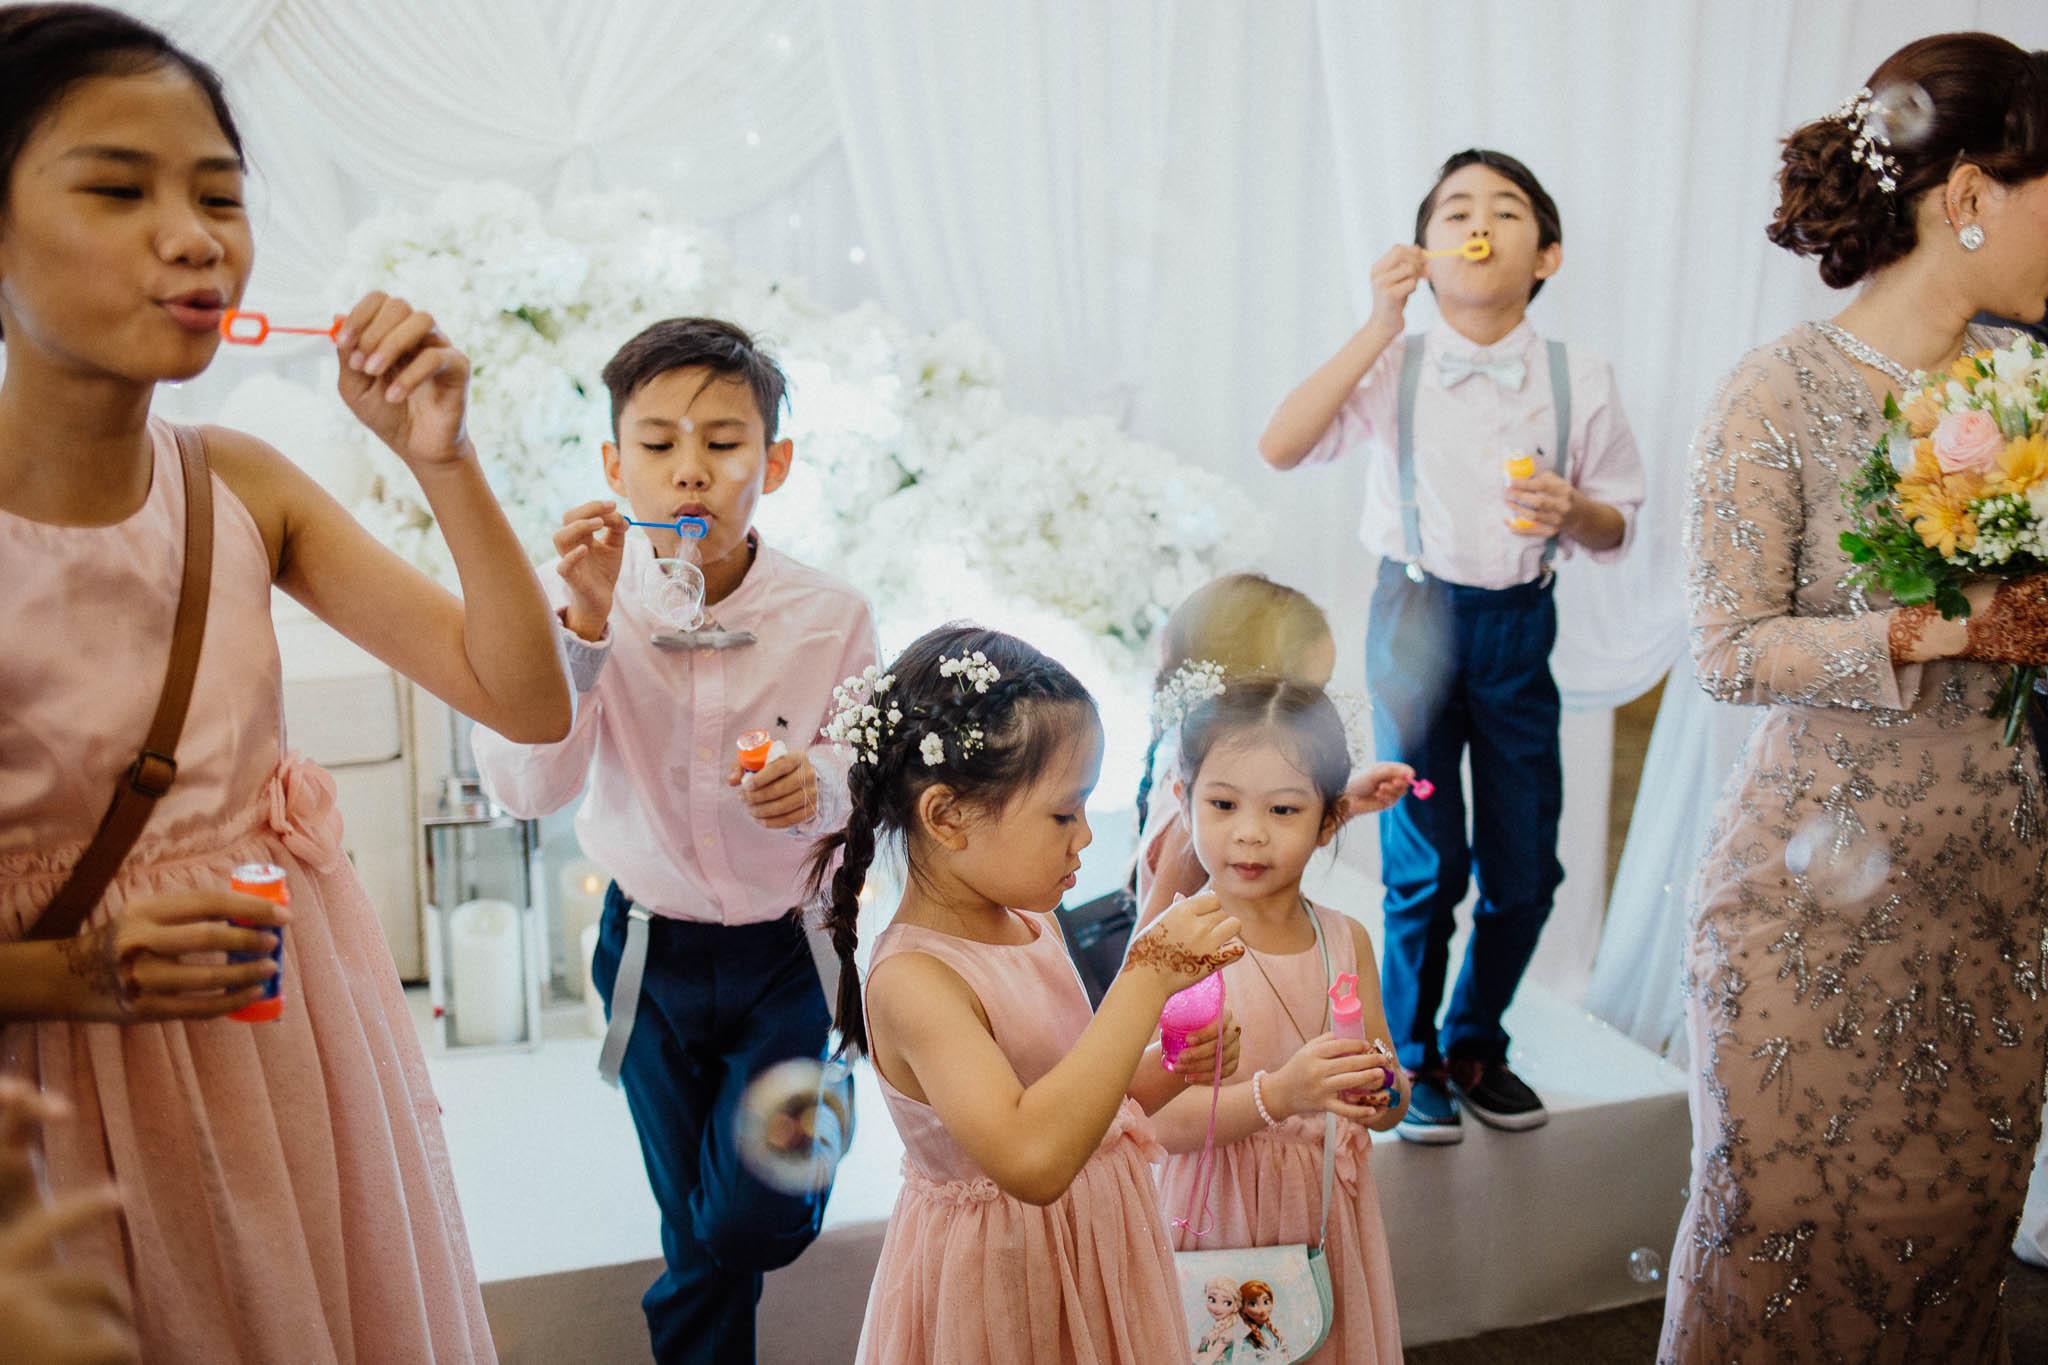 singapore-wedding-photographer-wedding-nufail-addafiq-055.jpg